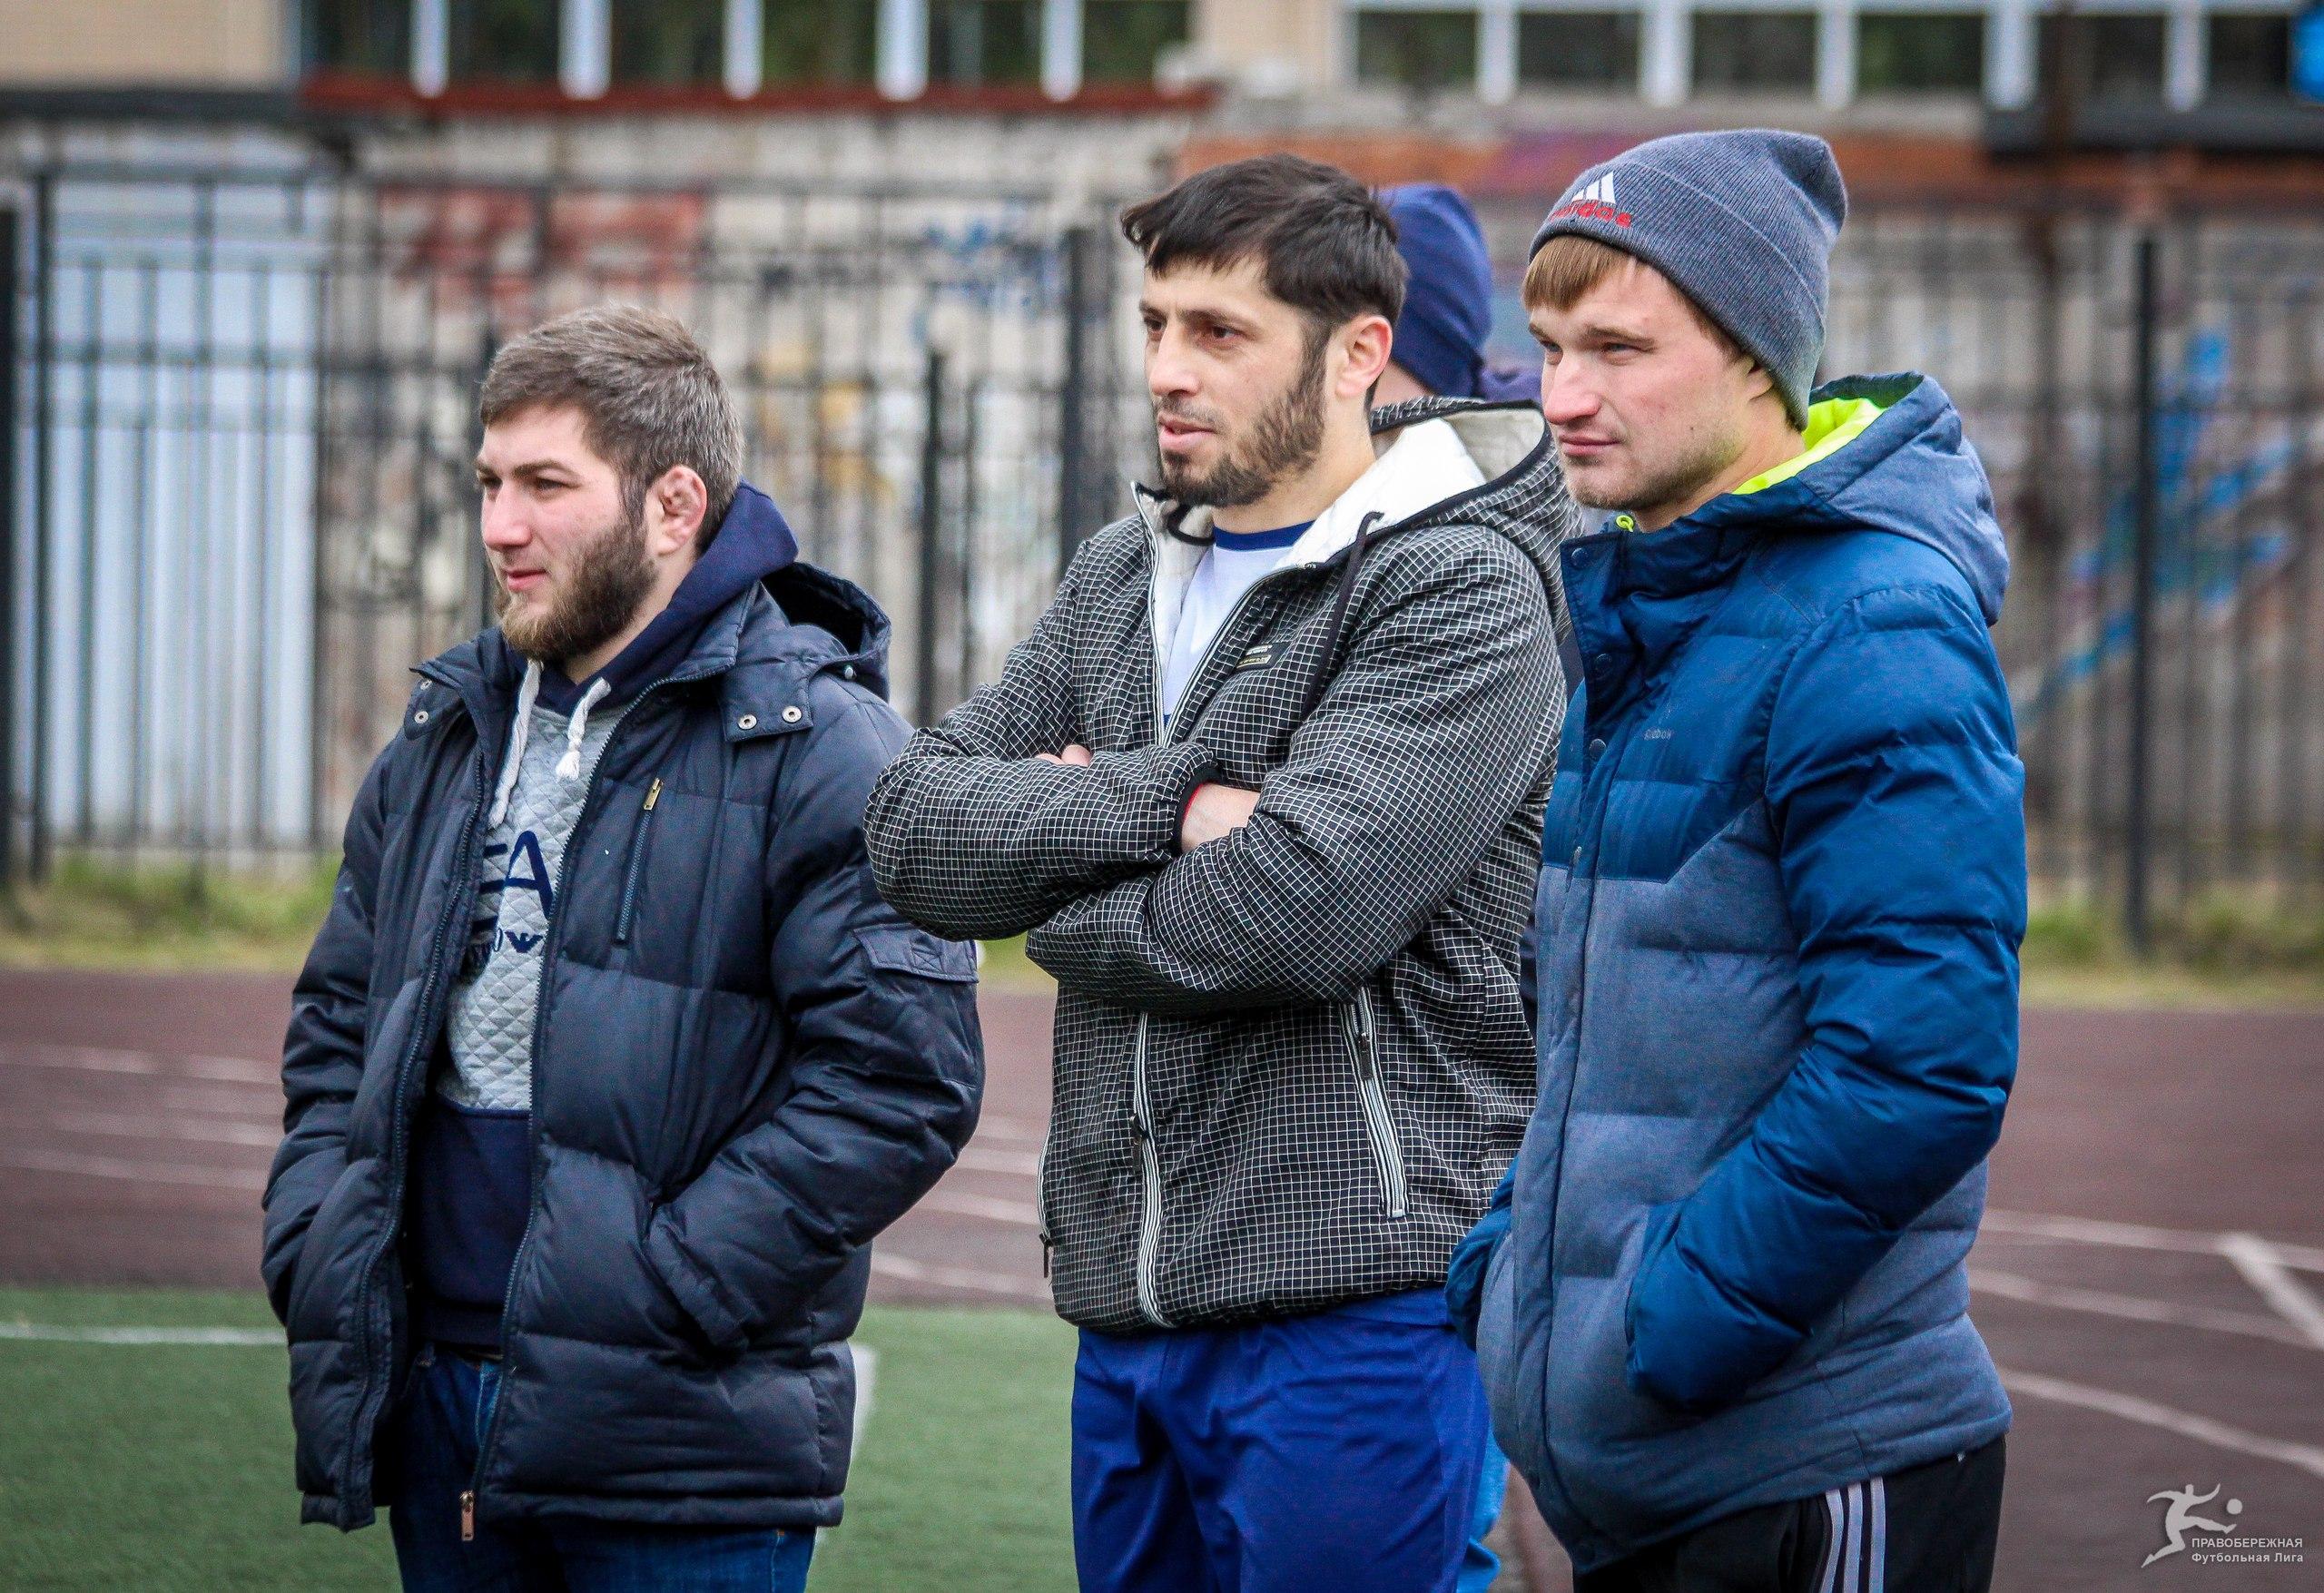 Башир Магомедшафиев и Виталий Александров